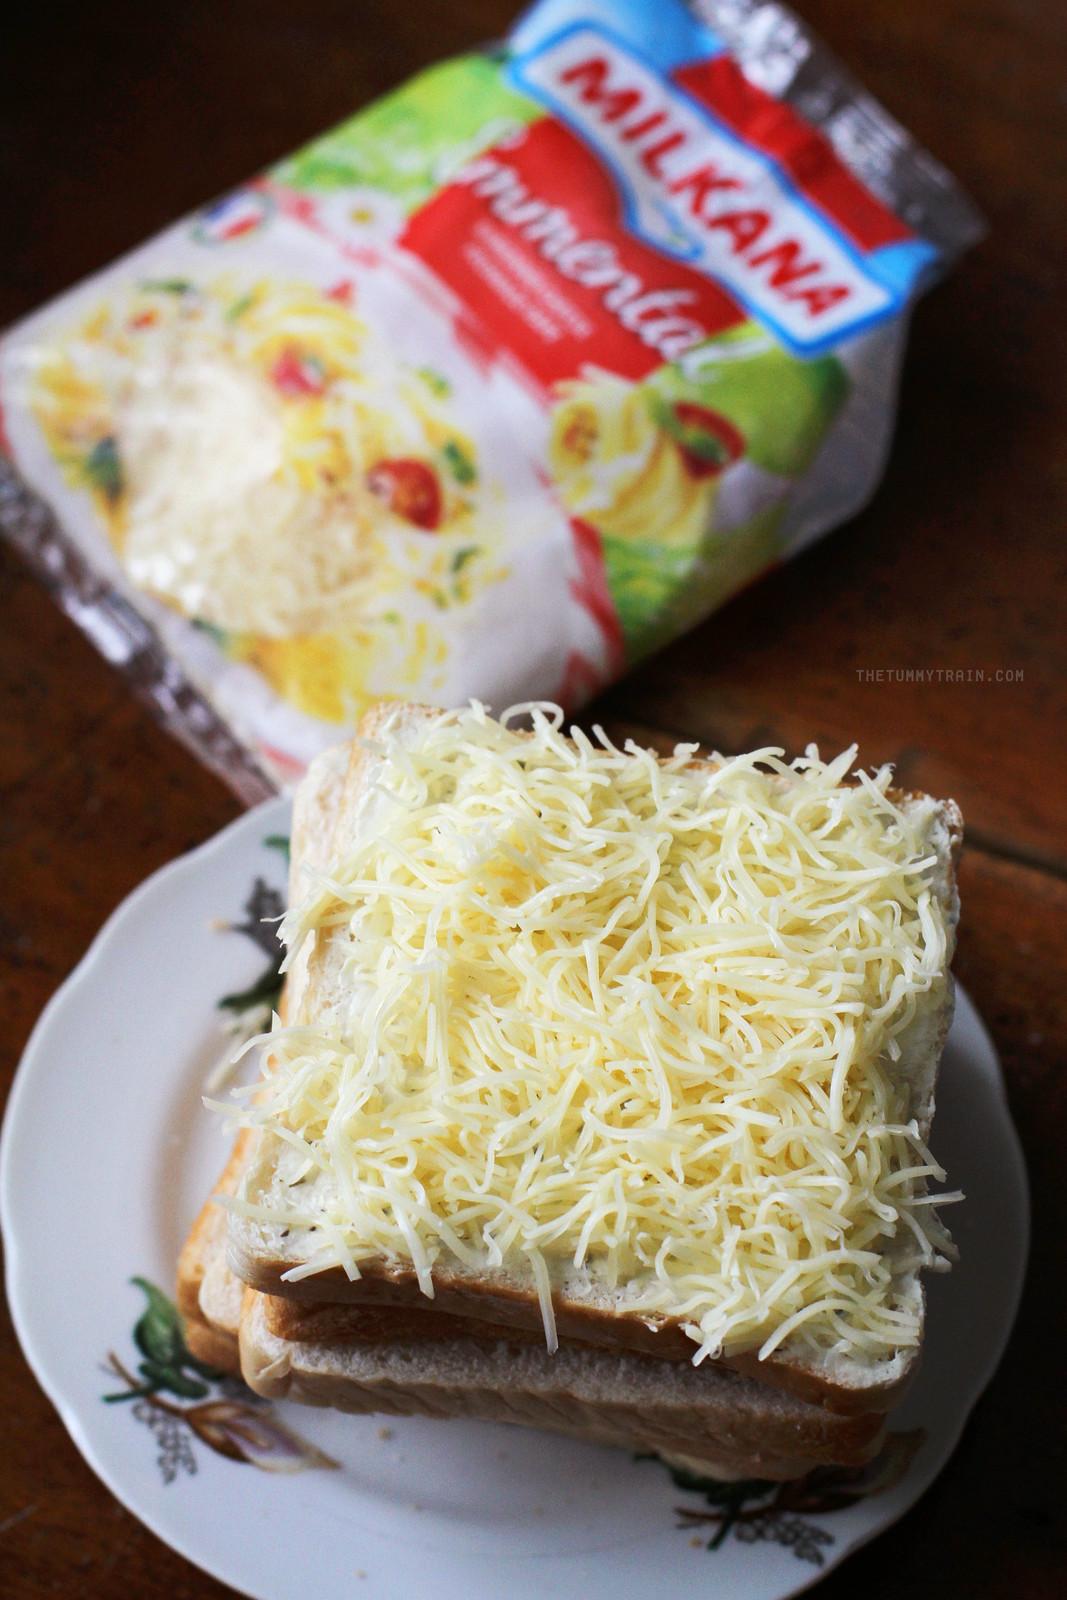 23627669436 dbb0e154ab h - Milkana Grilled Cheese Sandwiches for a little mid-week treat!